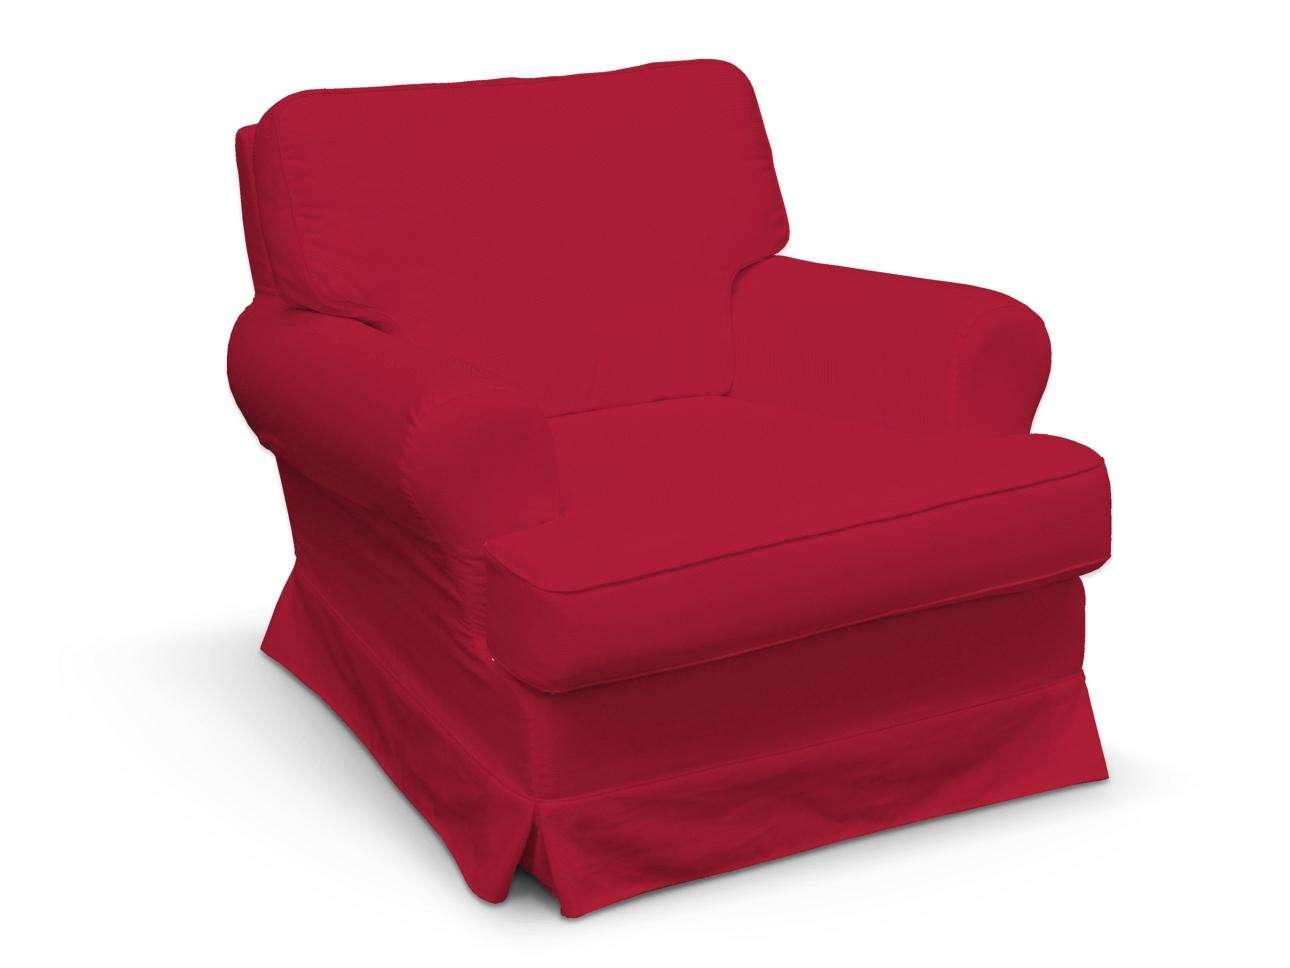 Barkaby Sesselbezug Sessel  Barkaby von der Kollektion Cotton Panama, Stoff: 702-04